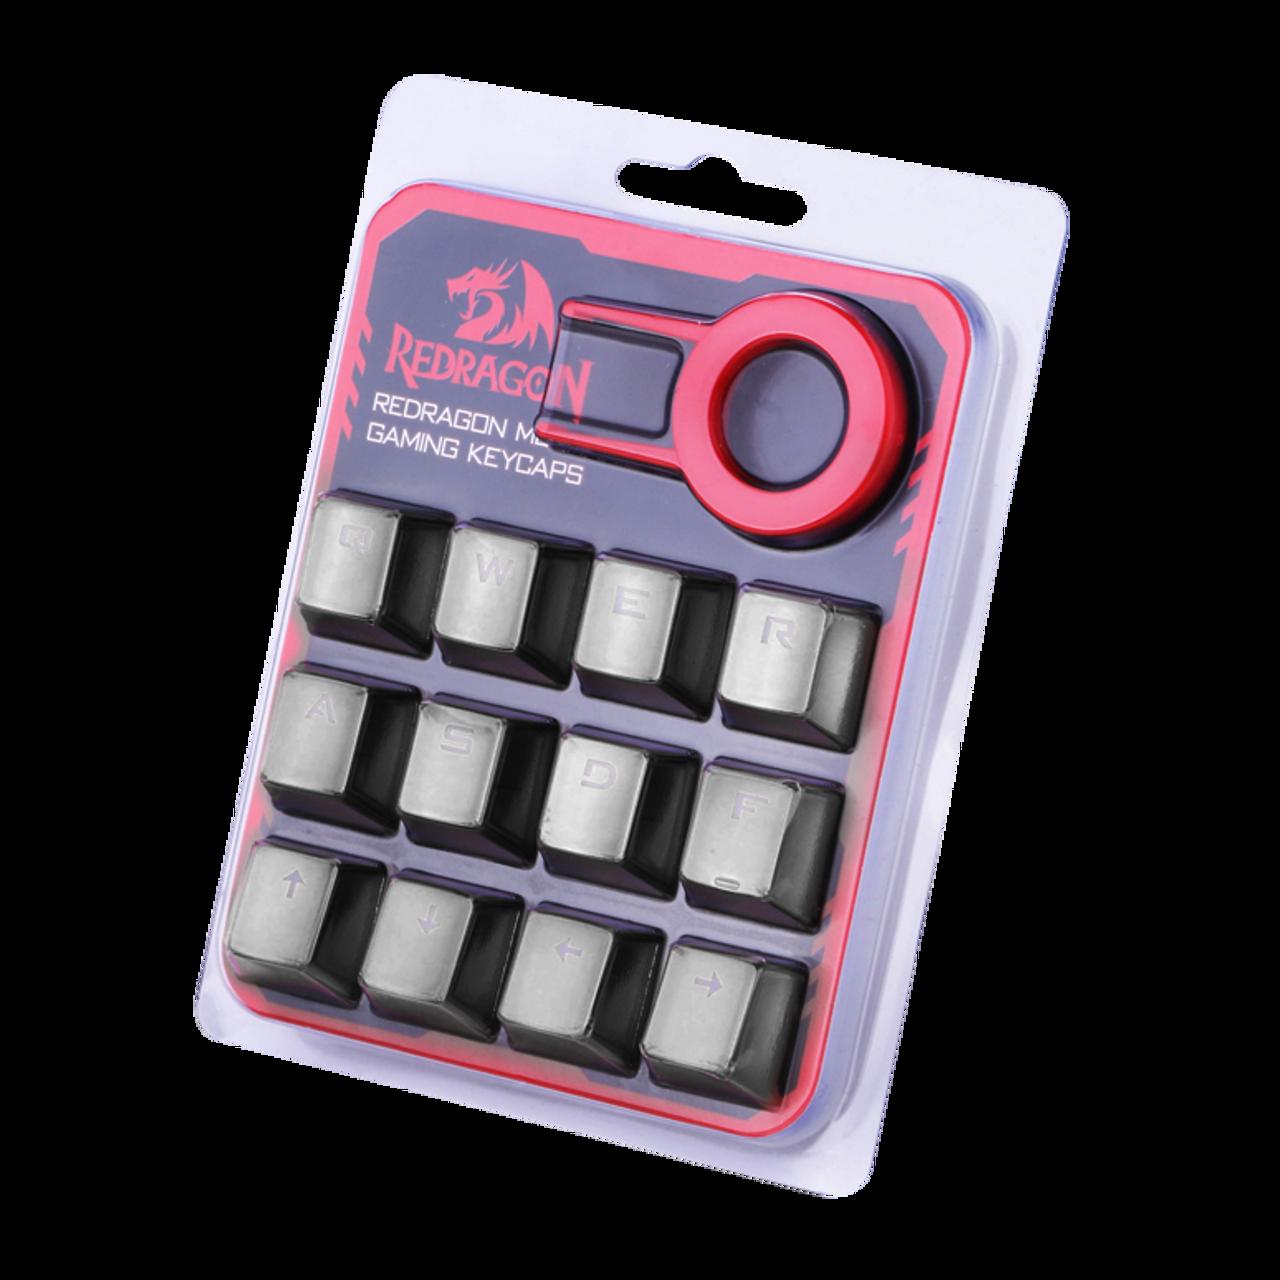 Redragon A103GR Mechanical Keyboard Caps 12 Chrome keycaps QWER, ASDF,  WASD, ARROW Keys MX Style with Key puller - Grey